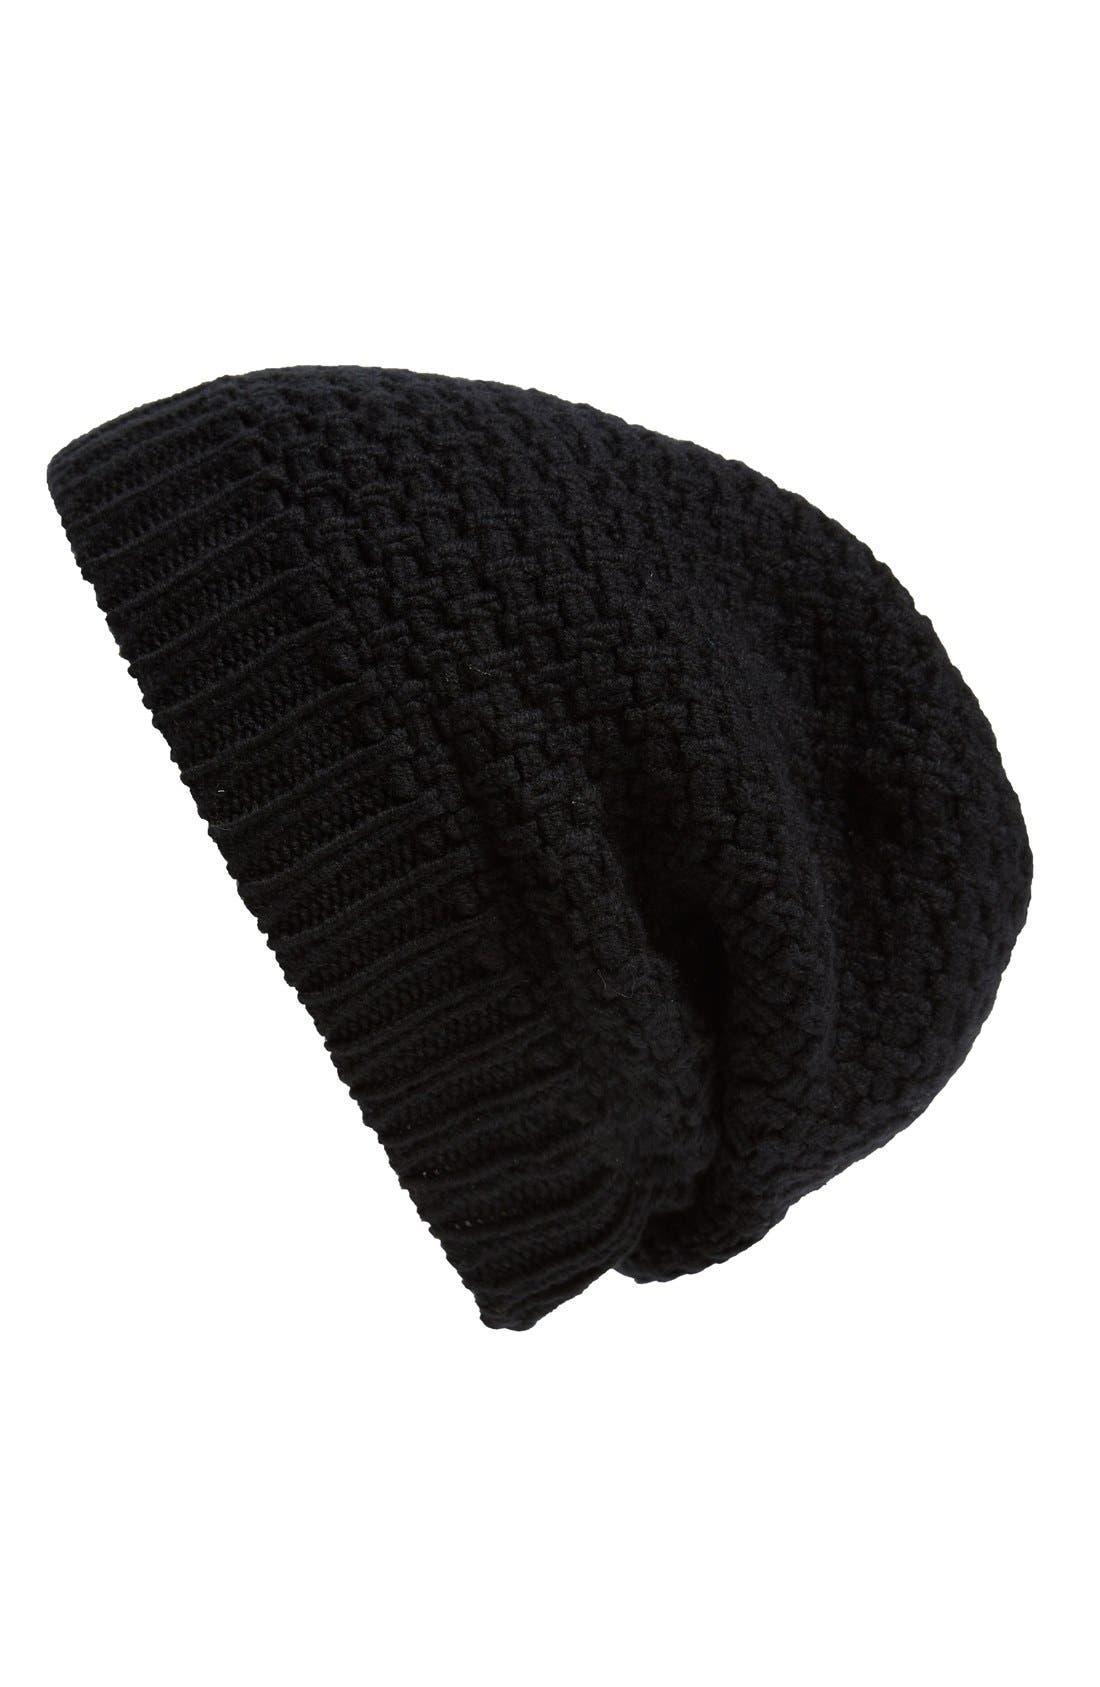 Main Image - Rick Owens Knit Wool Beanie